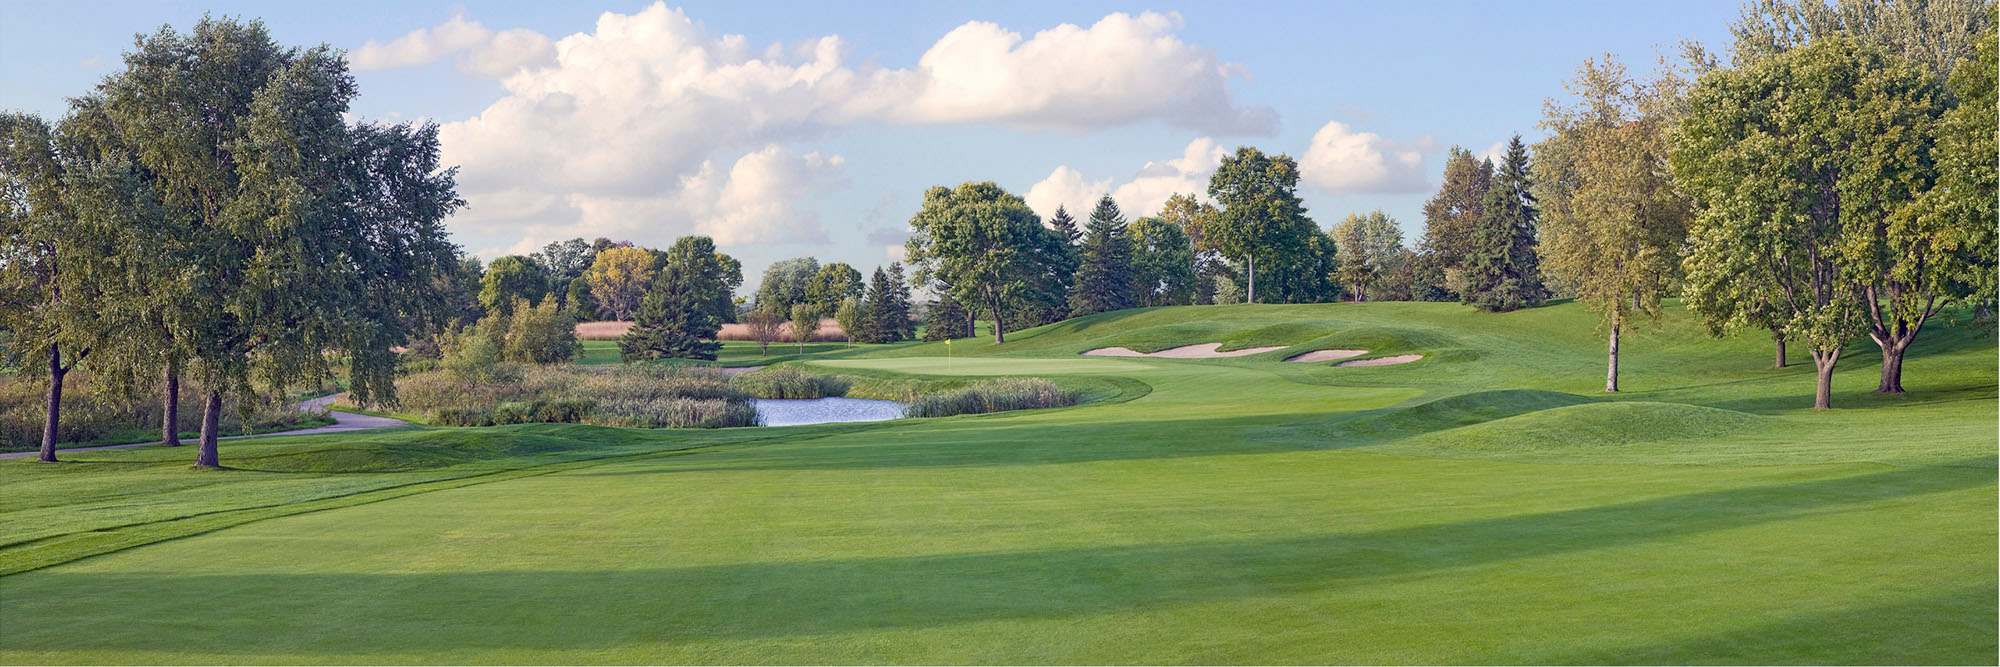 Golf Course Image - Hazeltine National Golf Club No. 7